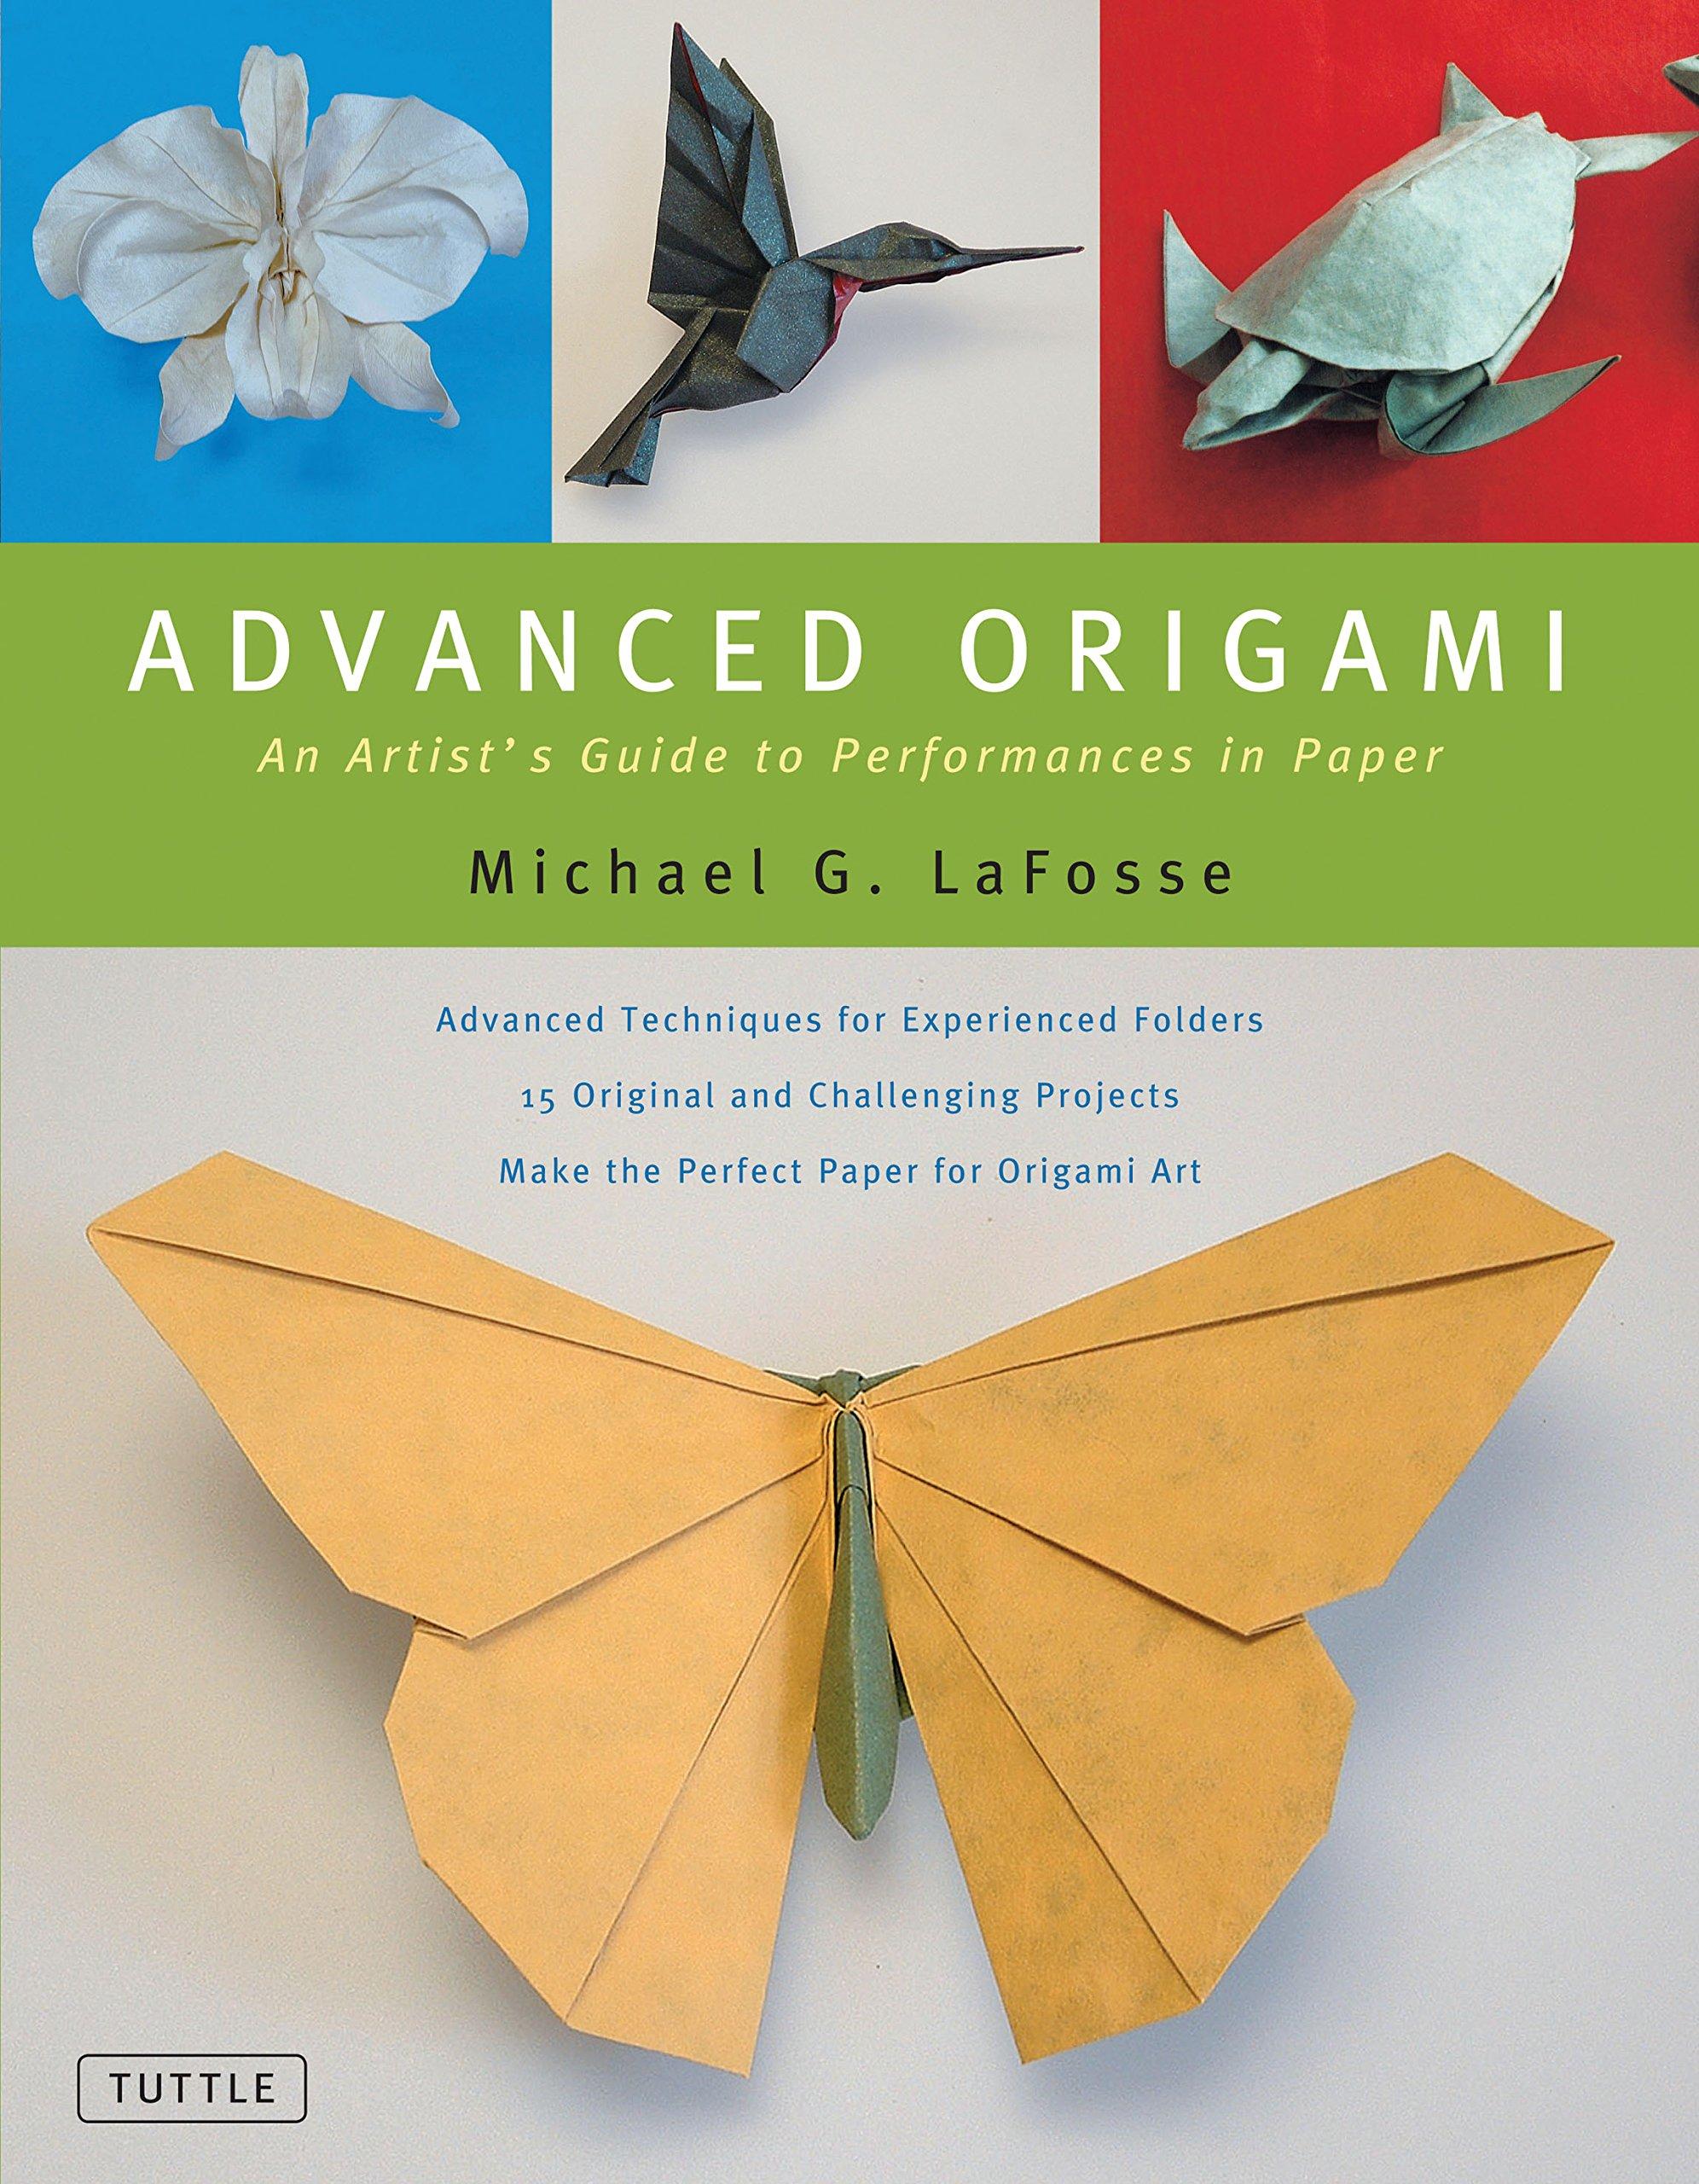 3D Origami Art Studio - Home | Facebook | 2560x1992